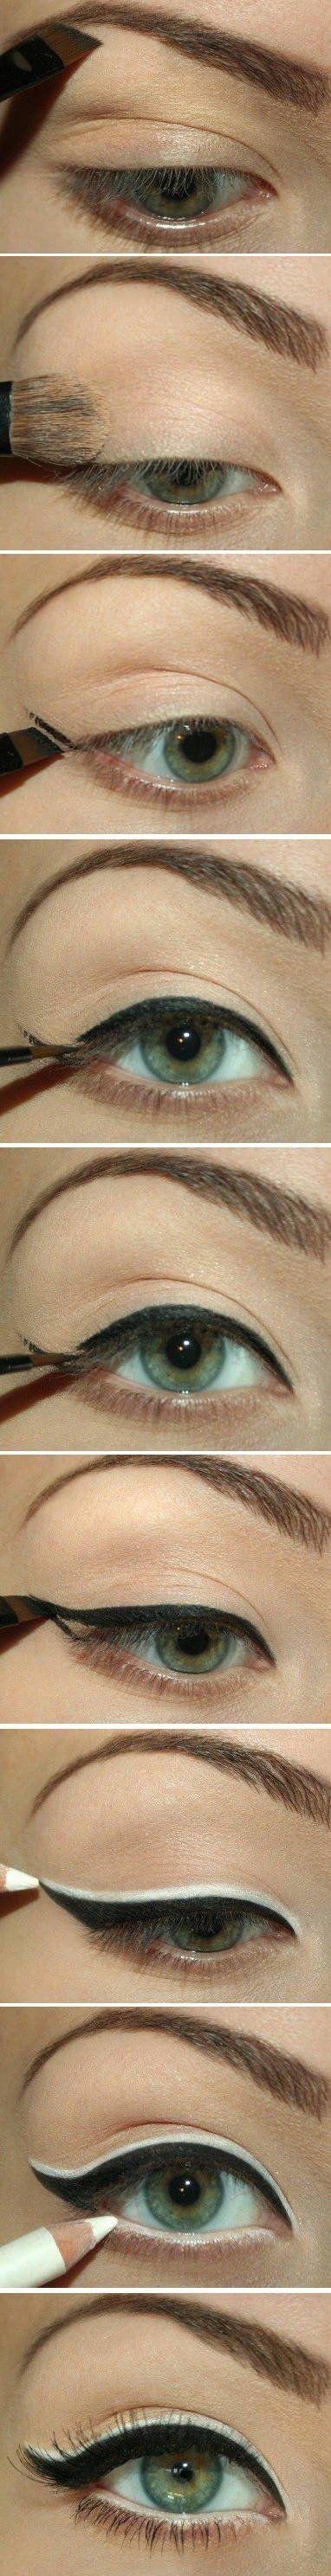 Beautiful Make-Up Idea Step-By-Step ♥Follow us♥